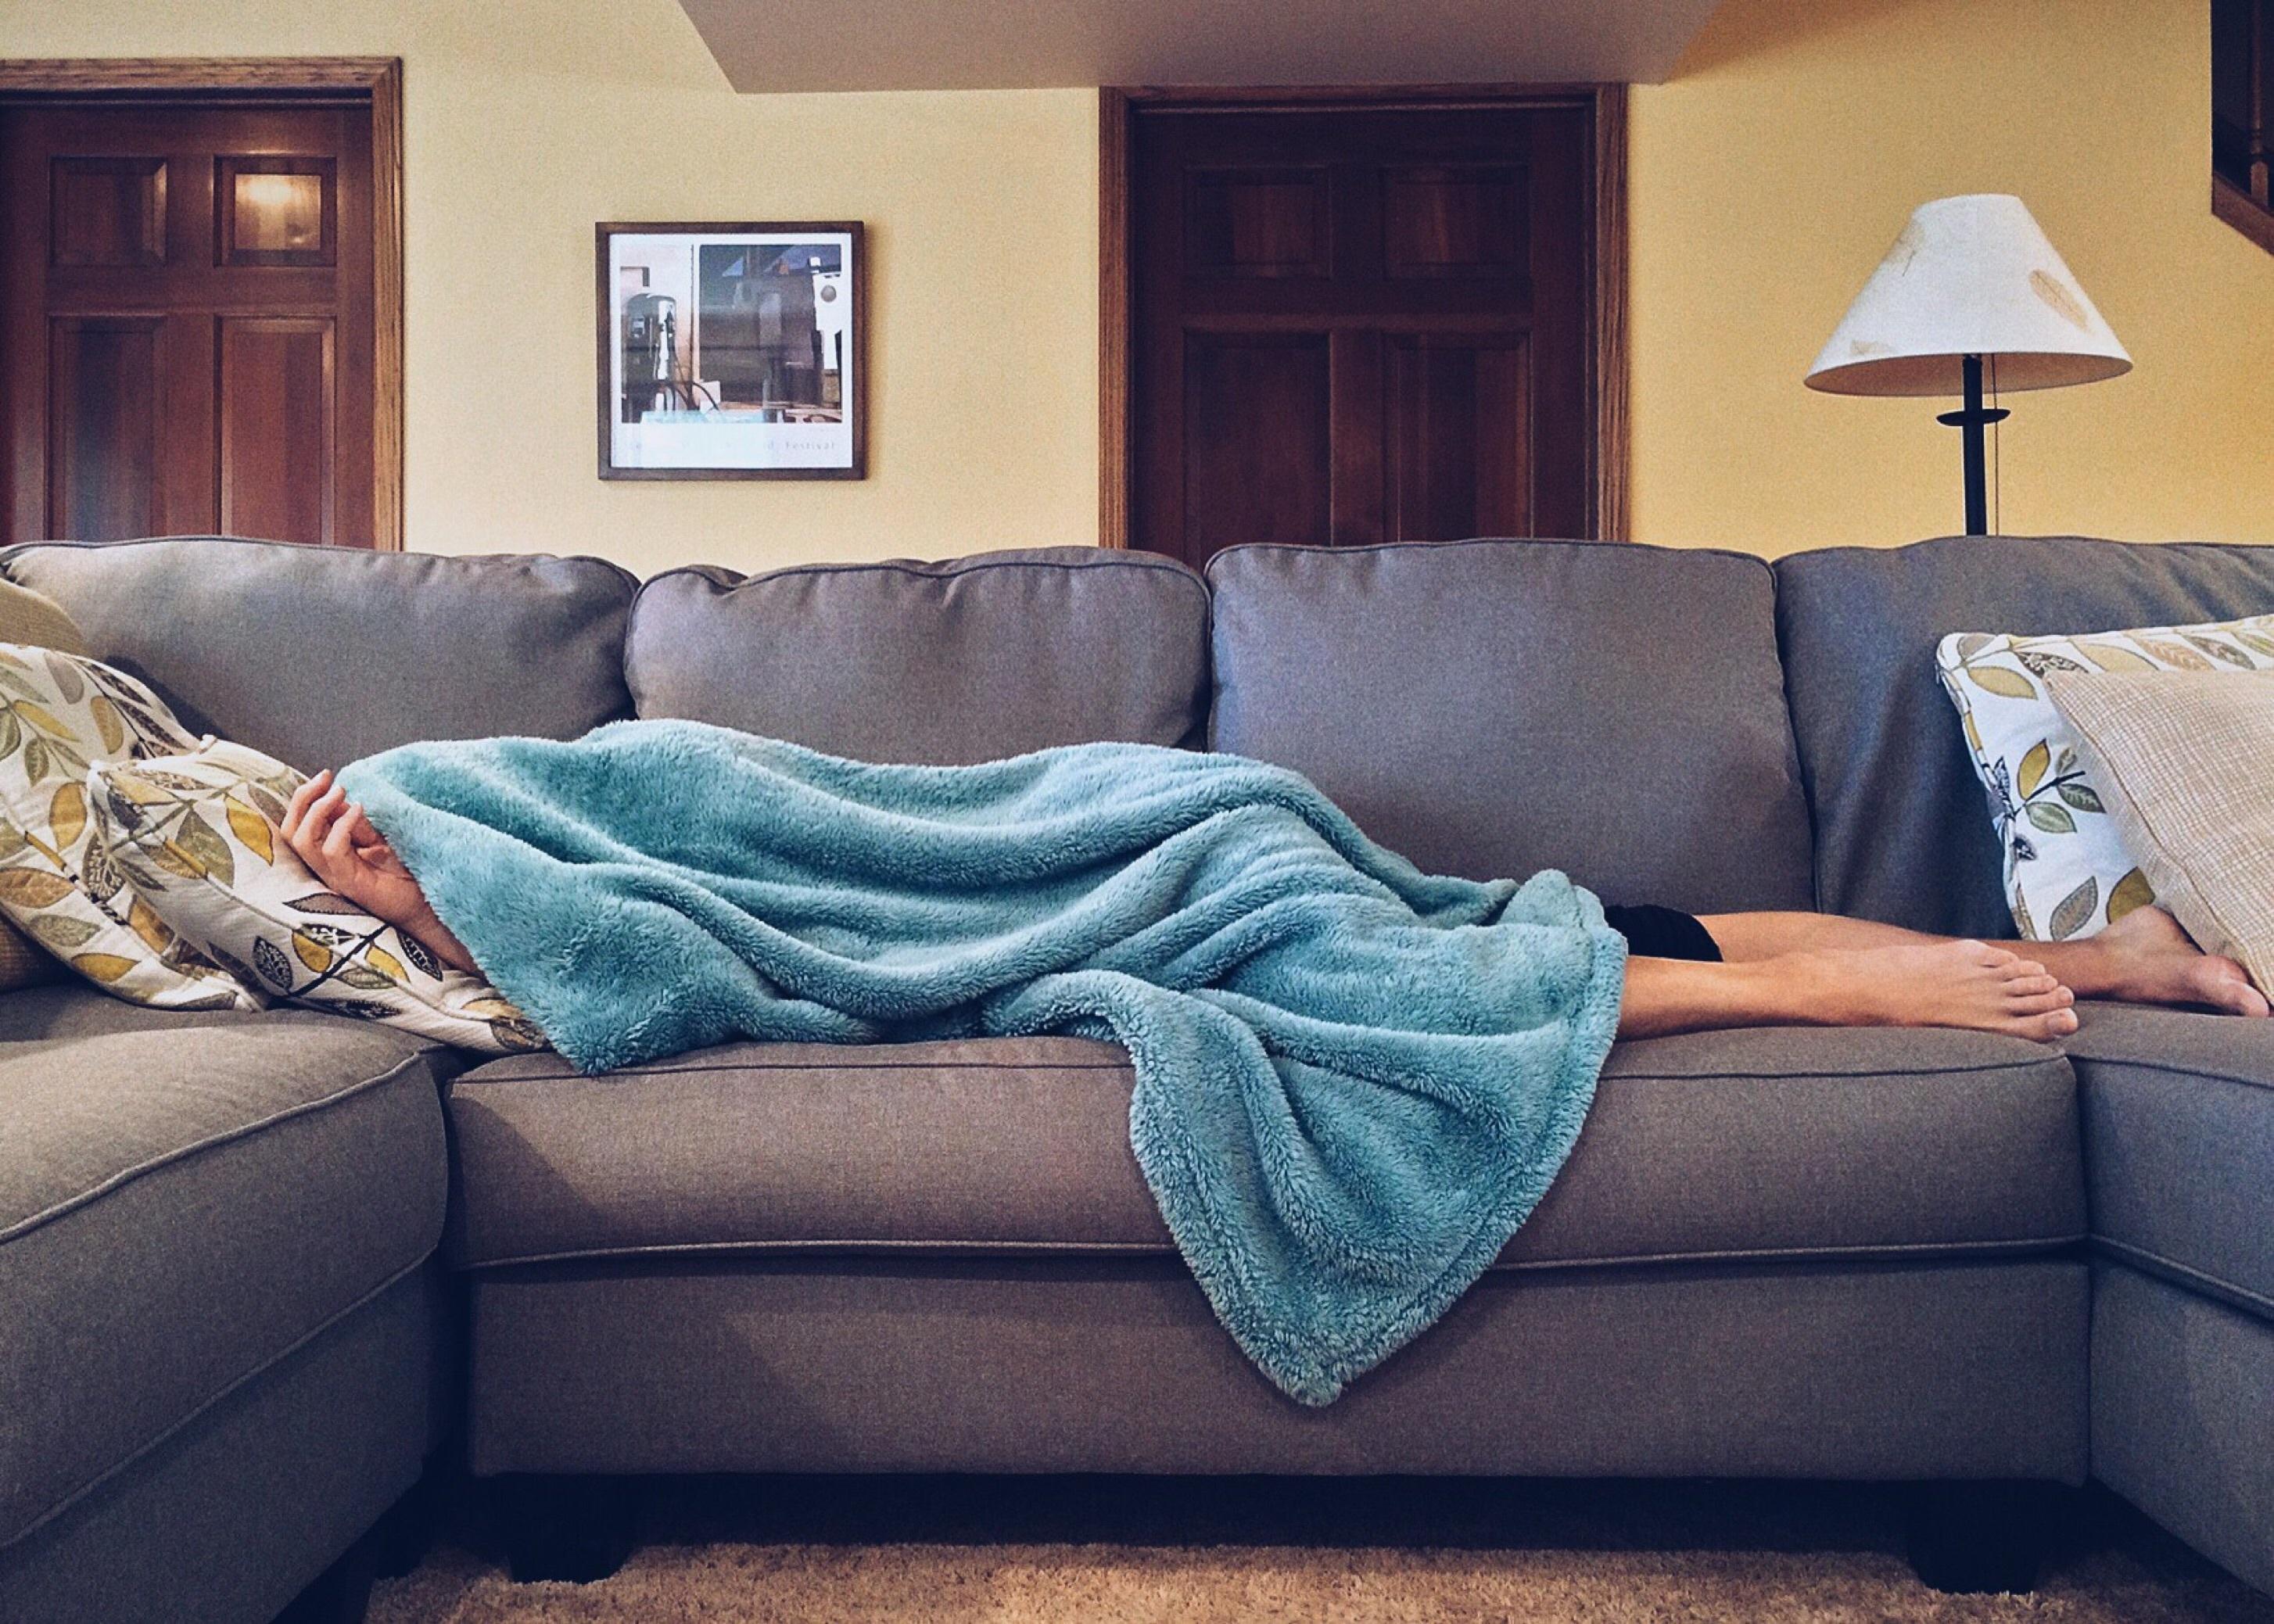 sleeping in front of tv.jpeg